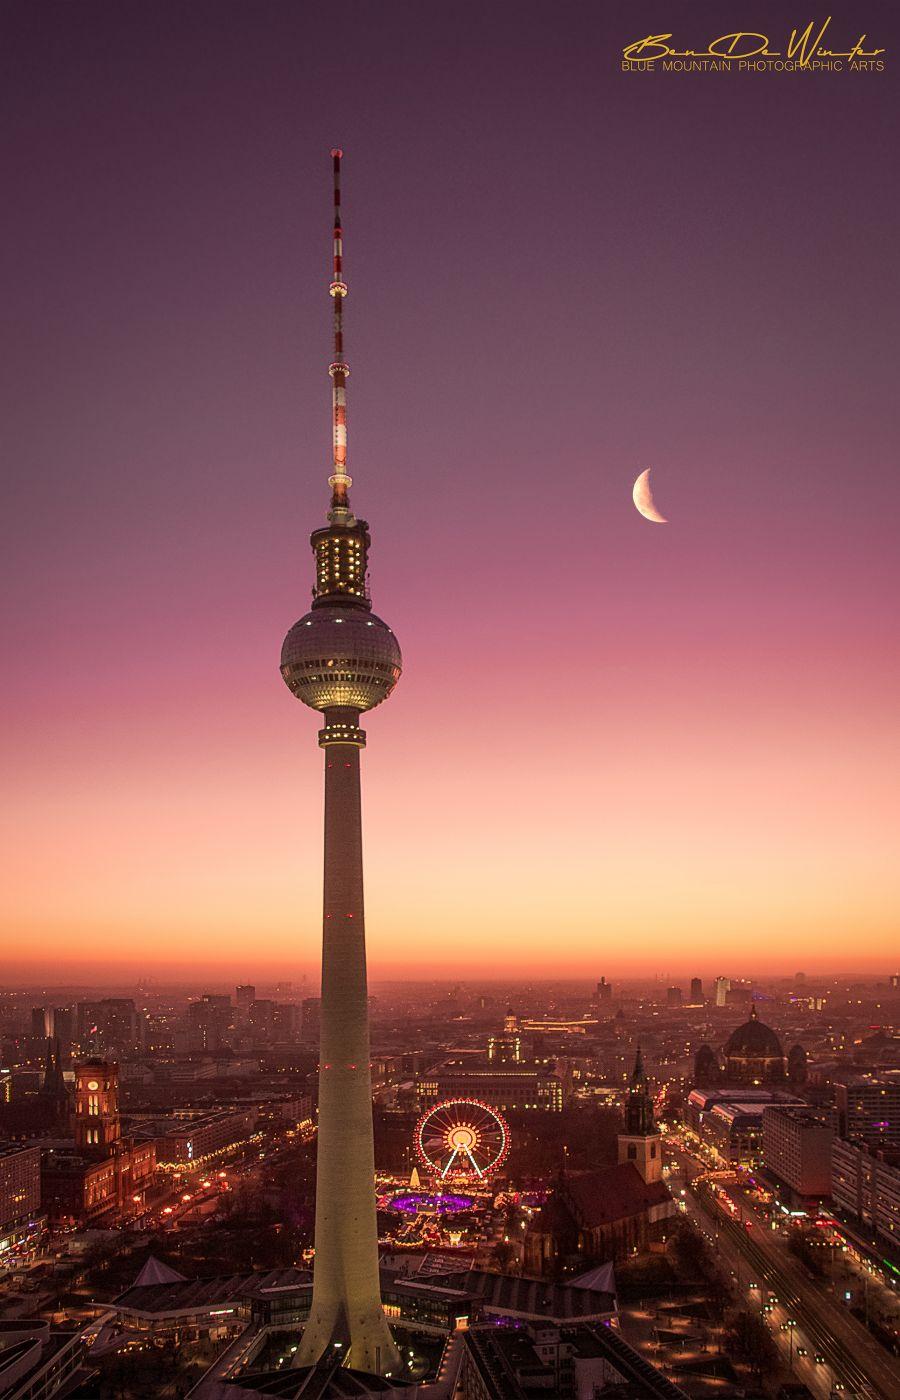 Berlin Fernsehturm, Germany